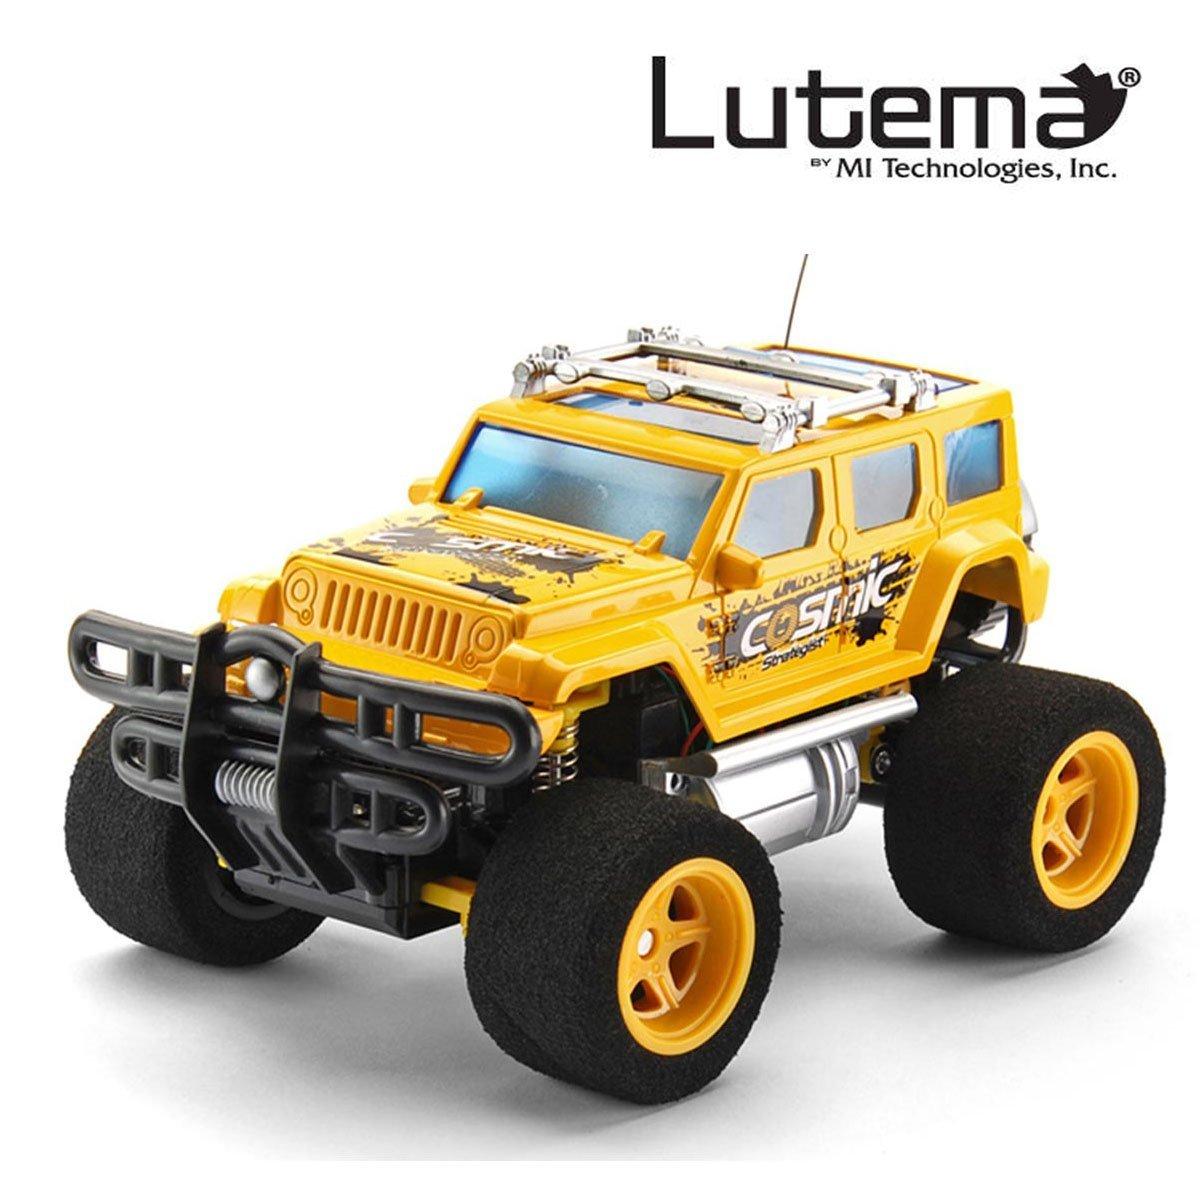 Lutema Cosmic Rocket 4Ch Remote Control Truck Yellow 10